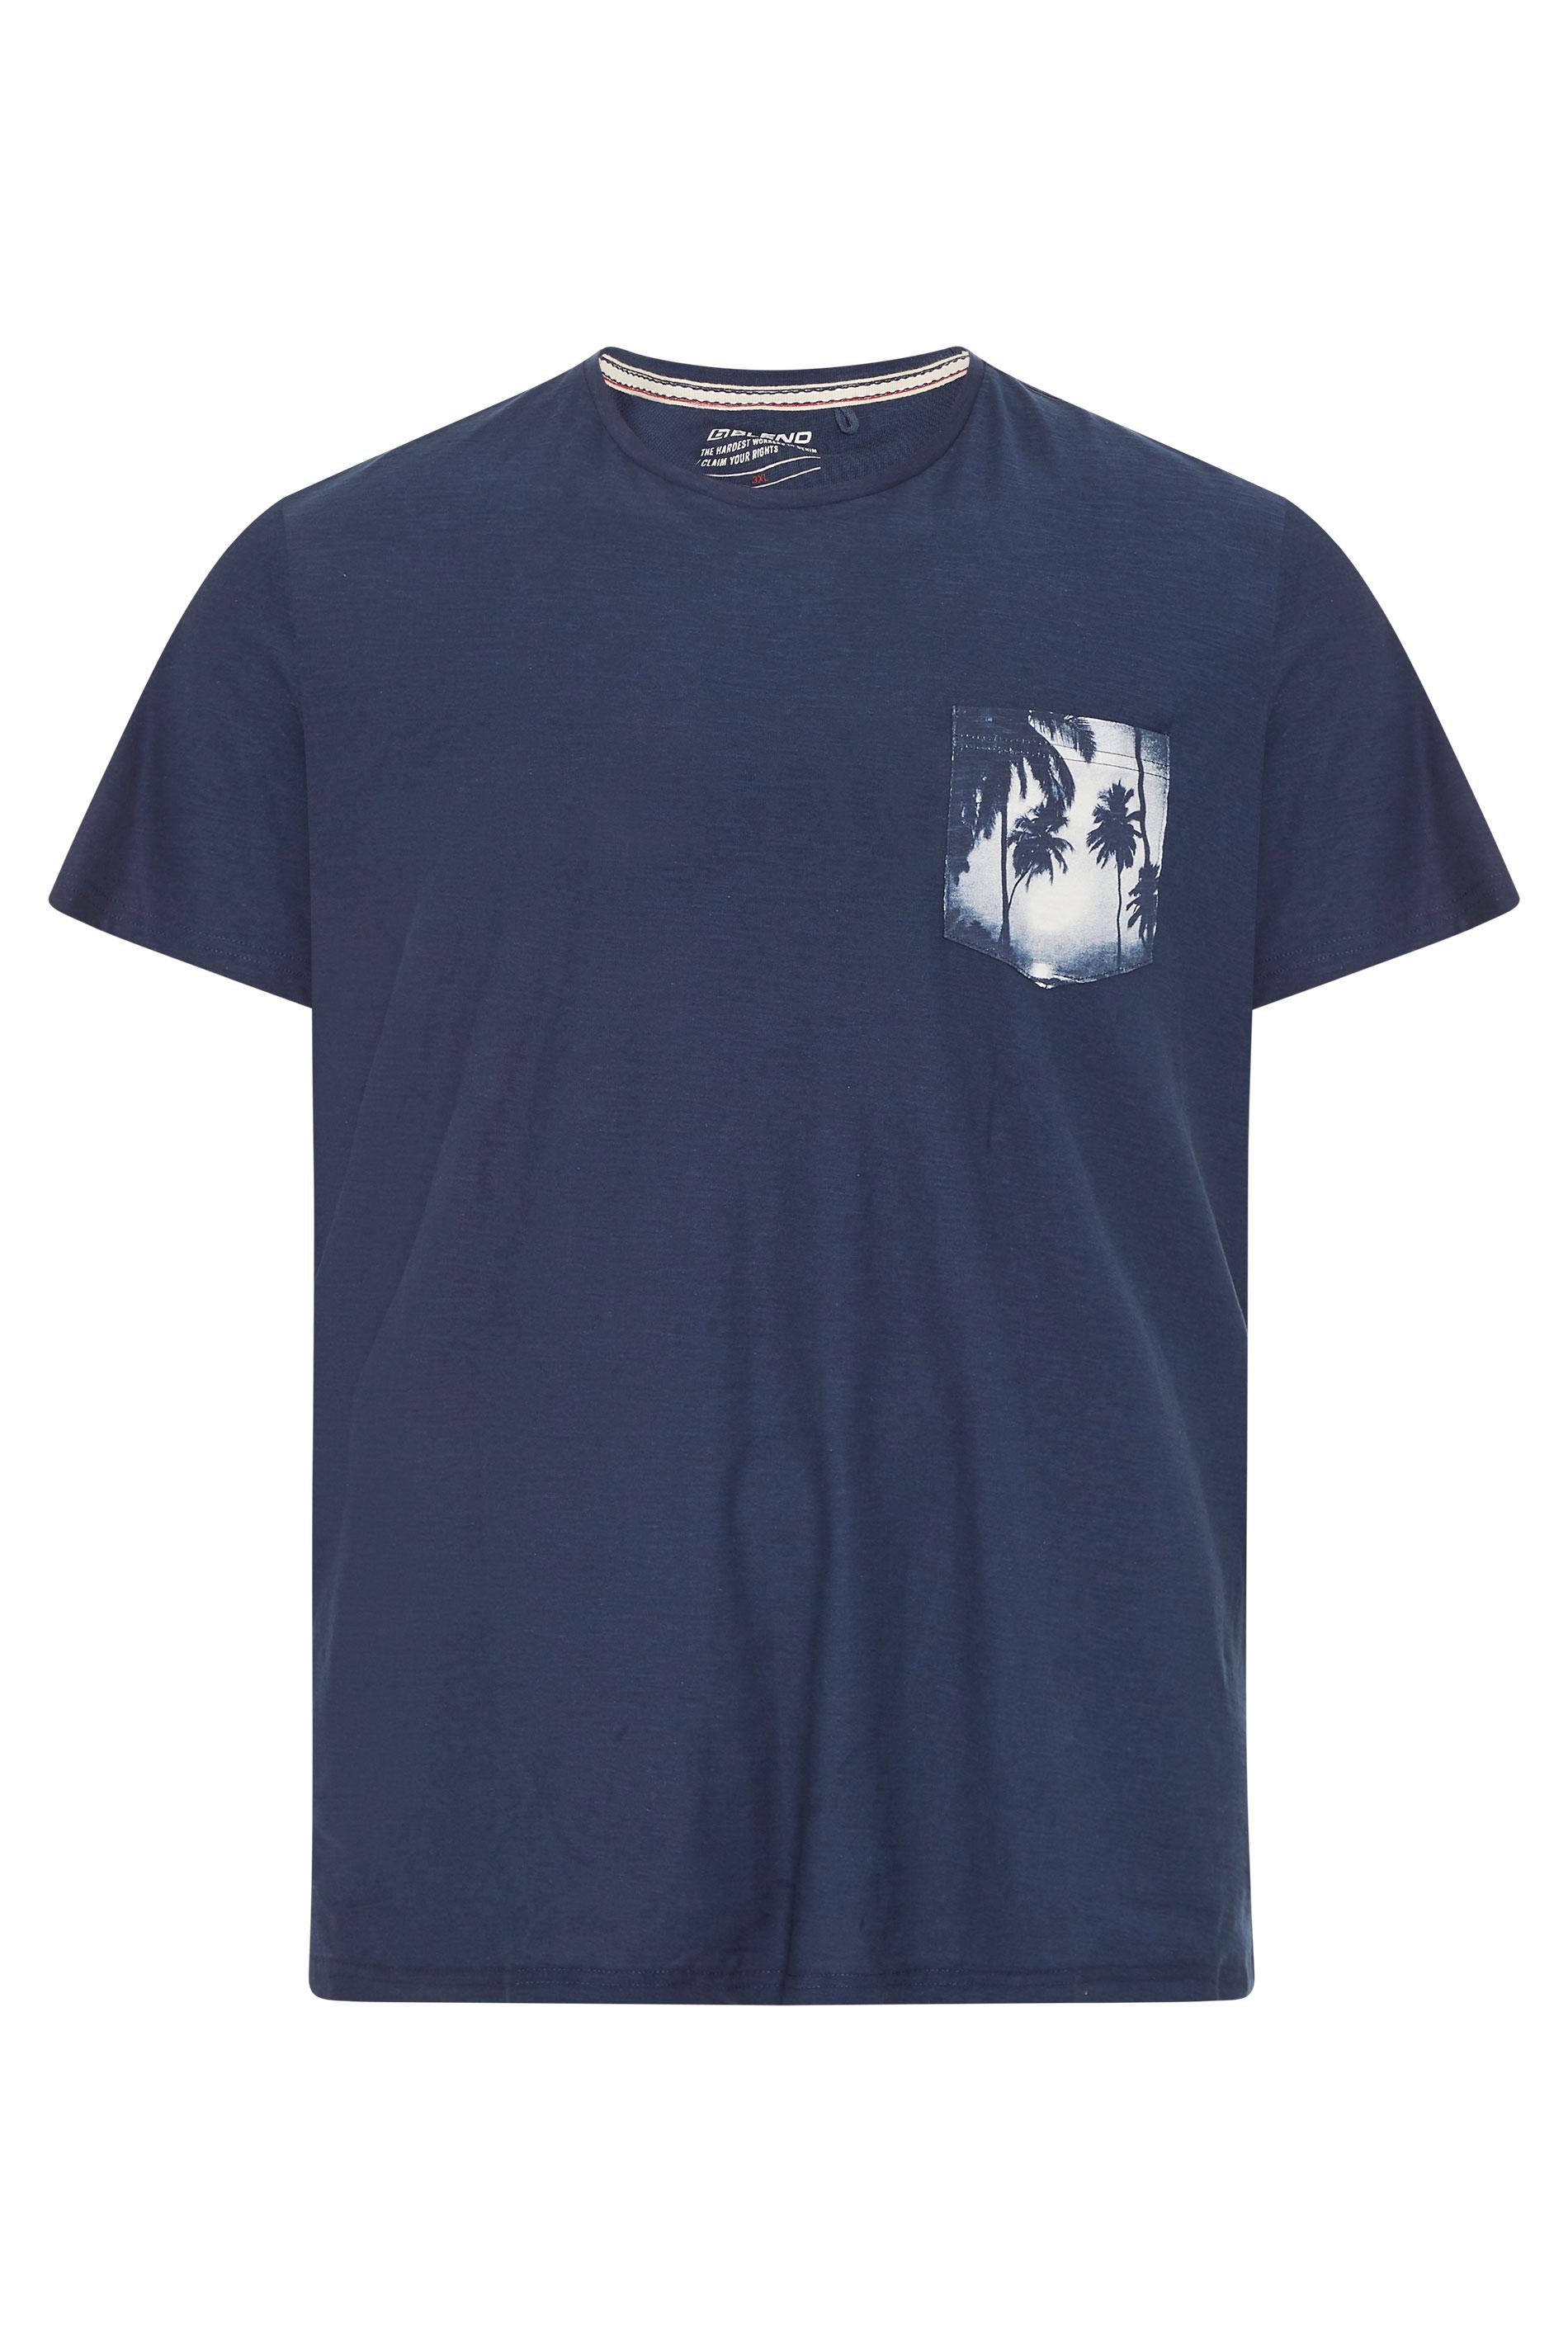 BLEND Navy Palm Pocket T-Shirt